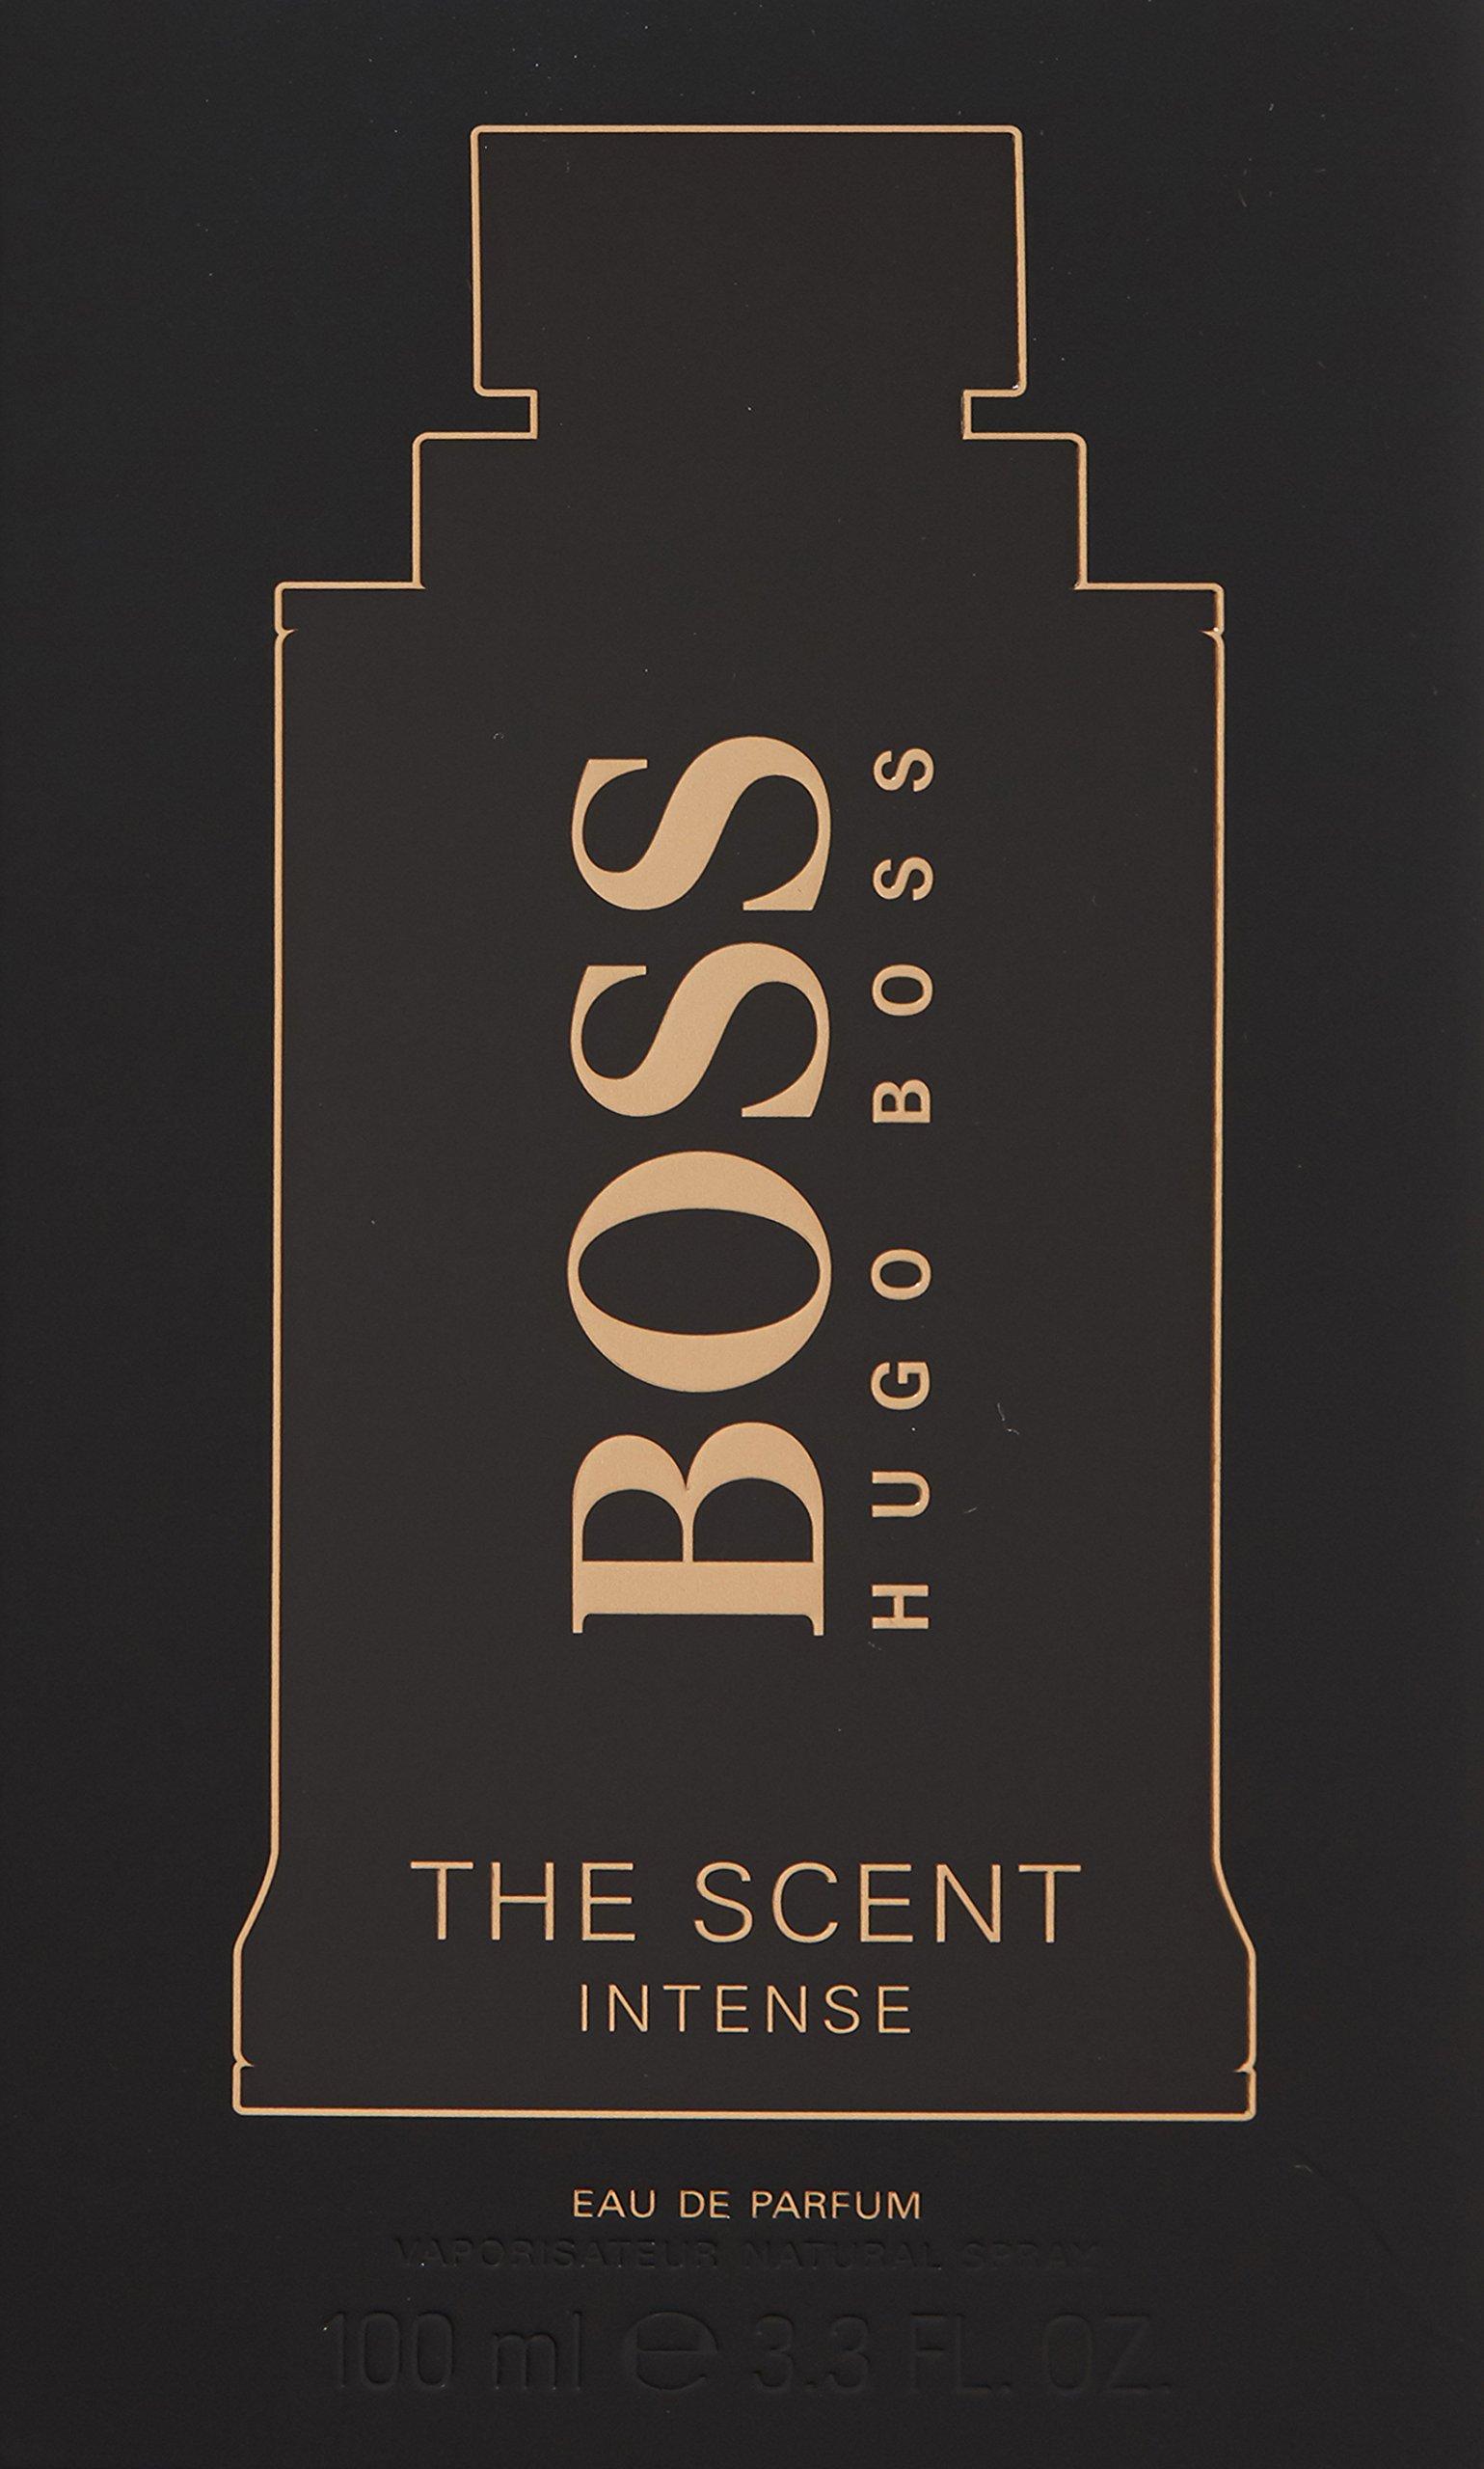 Hugo Boss THE SCENT INTENSE Eau de Parfum, 3.3 Fl Oz by Hugo Boss (Image #3)